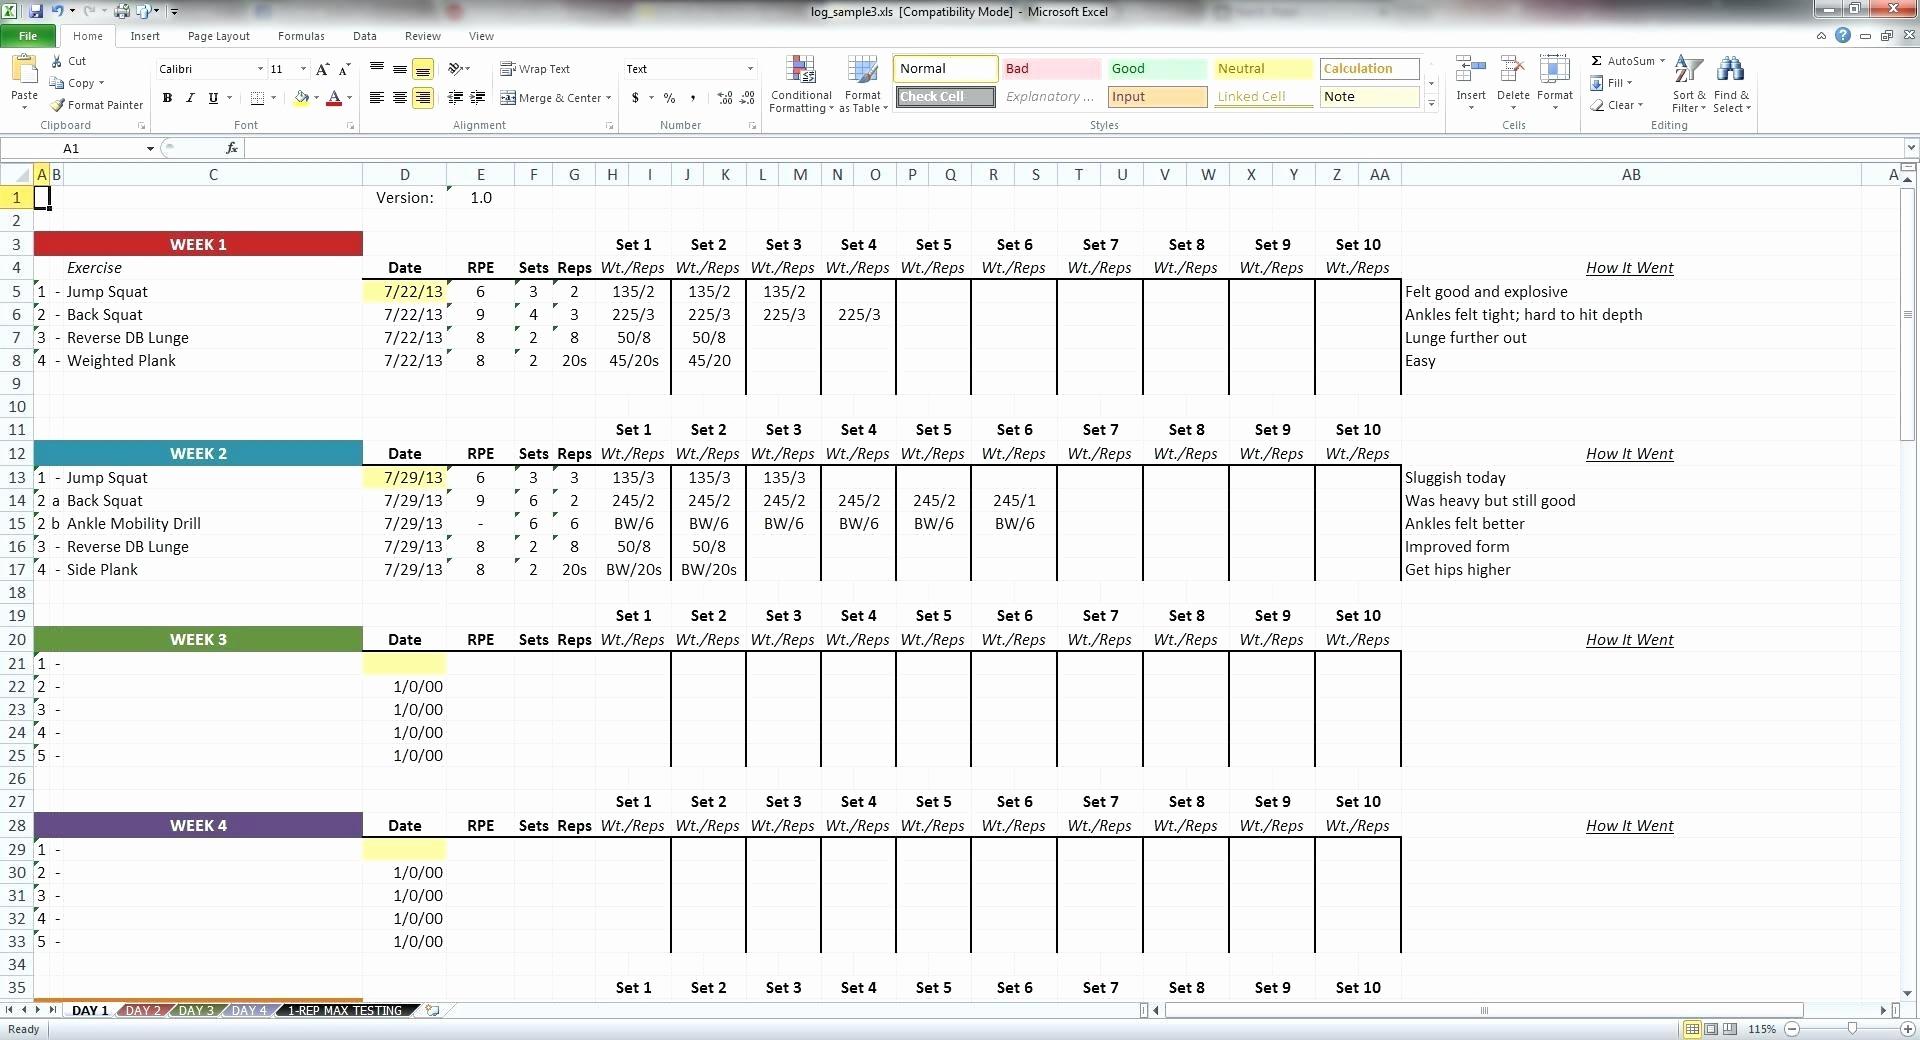 Employee Training Tracker Excel Spreadsheet Awesome Template Inside Excel Spreadsheet Templates For Tracking Training